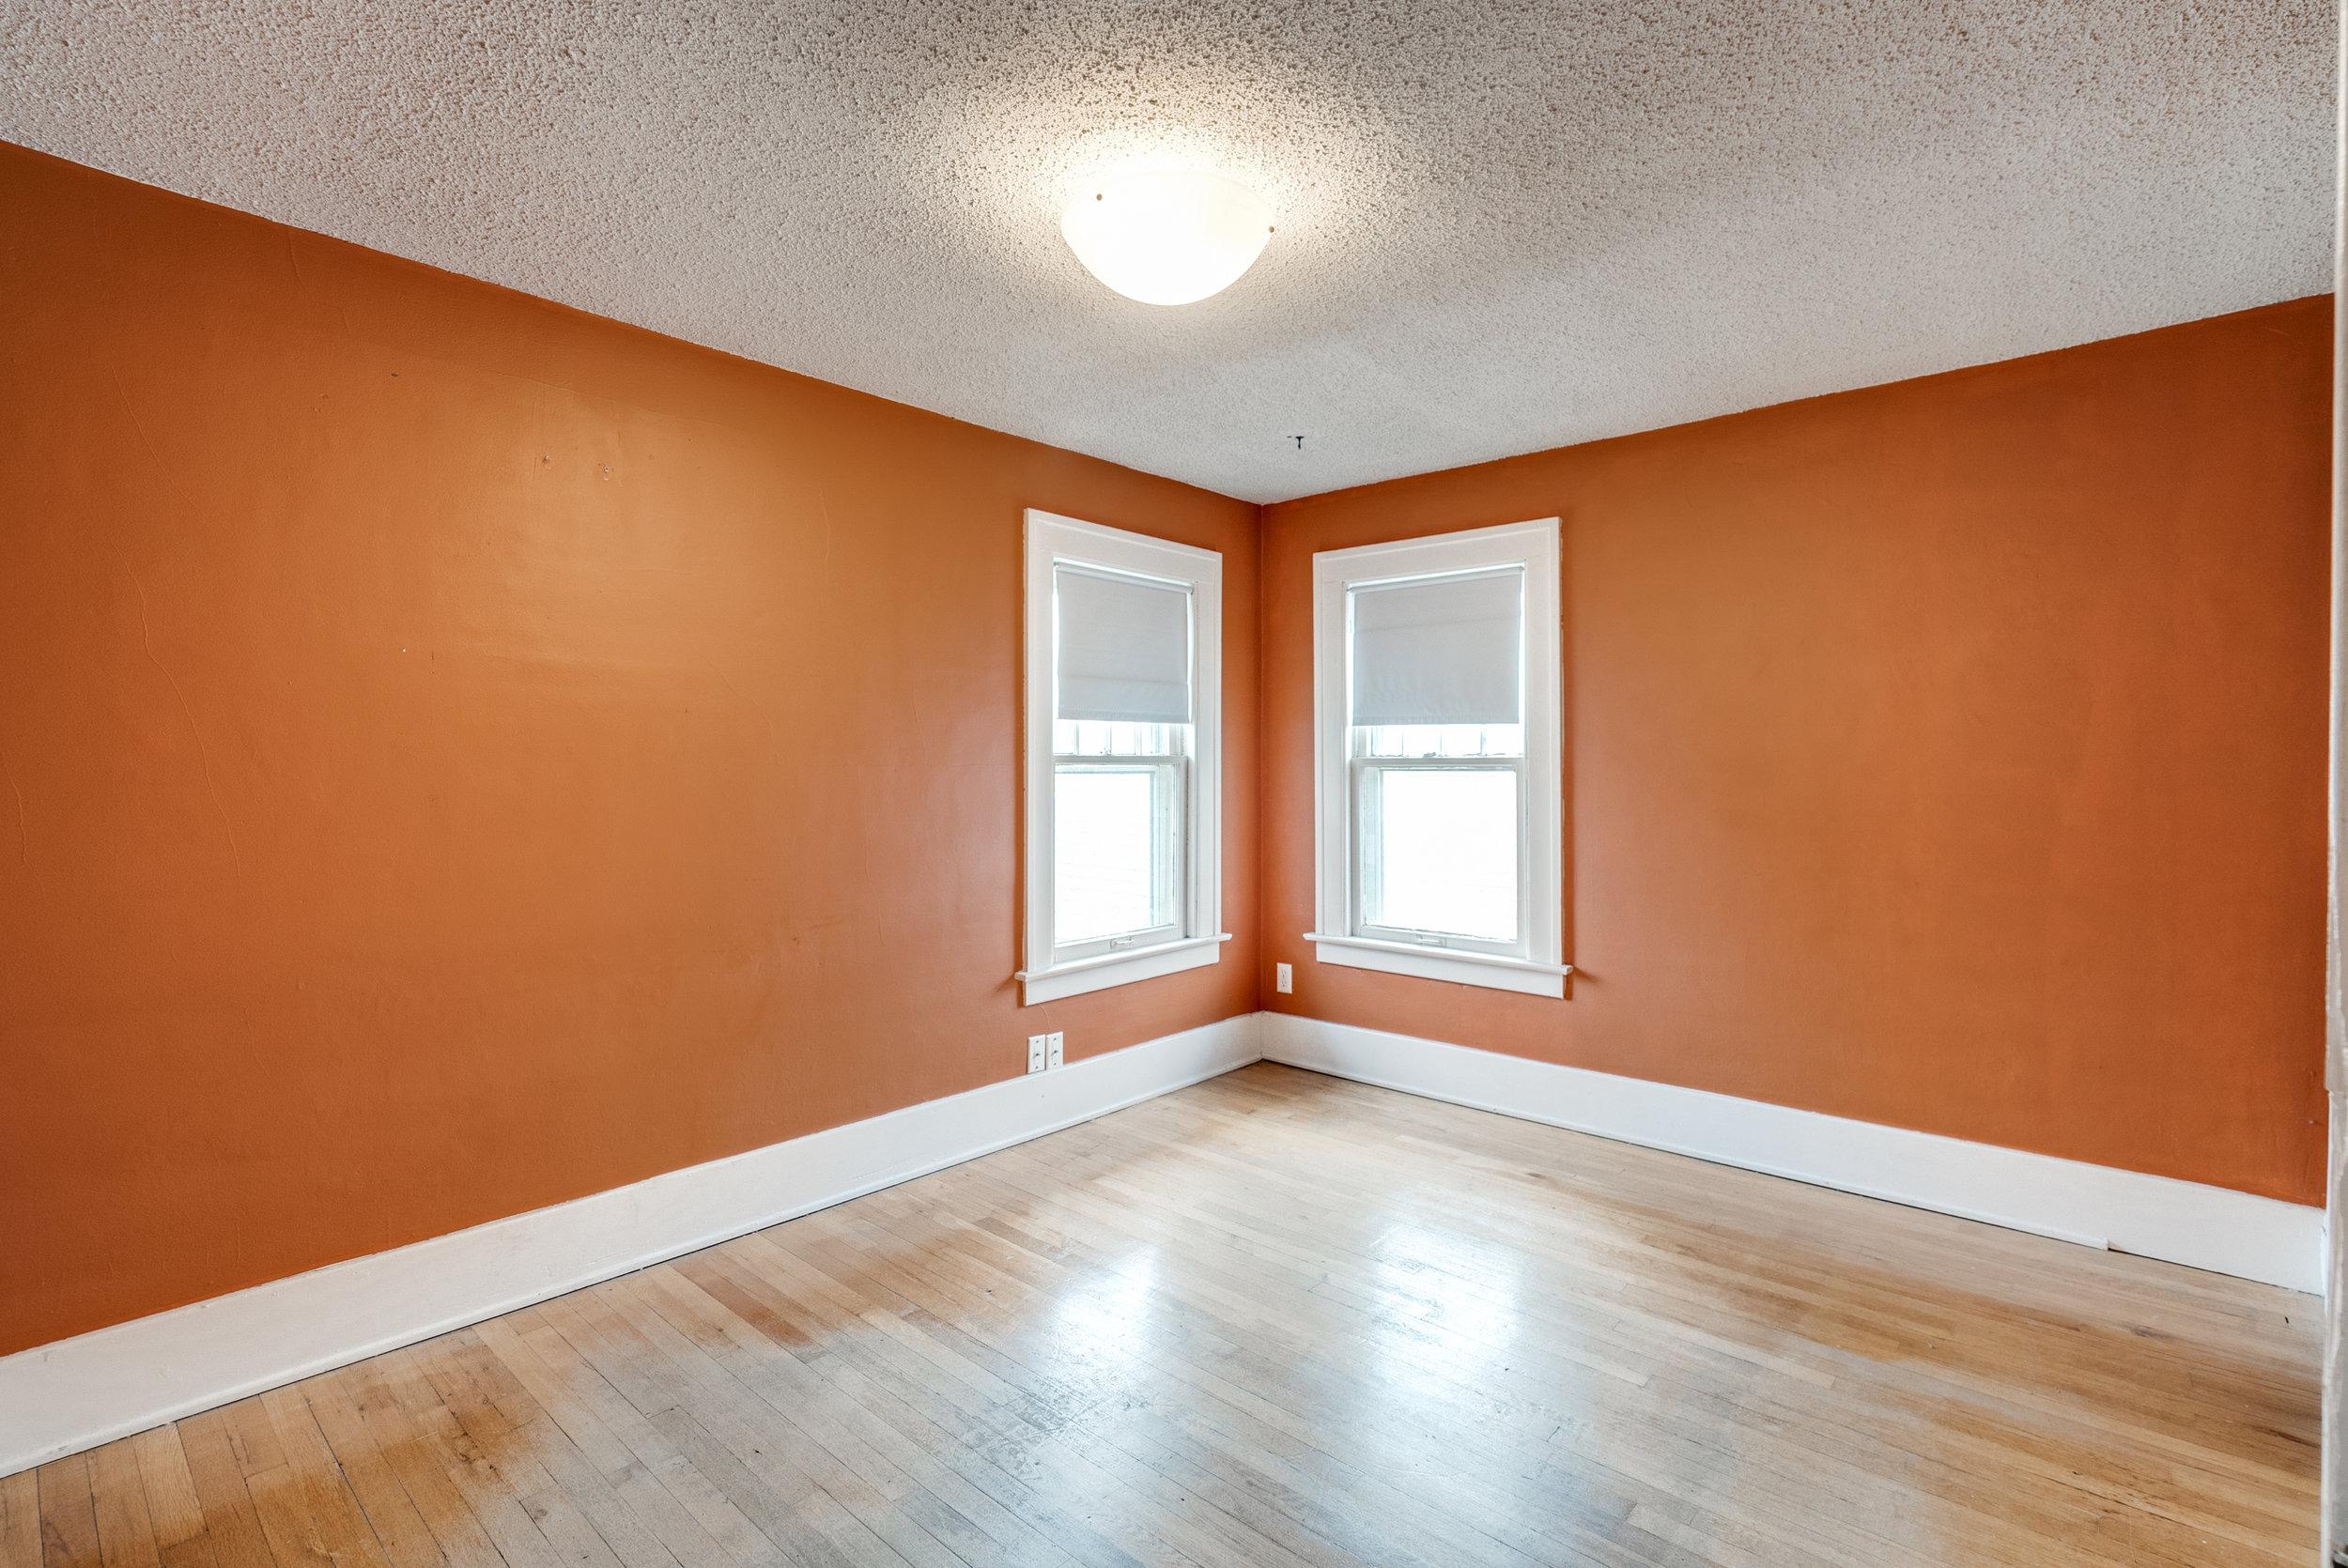 Interiors 21.jpg